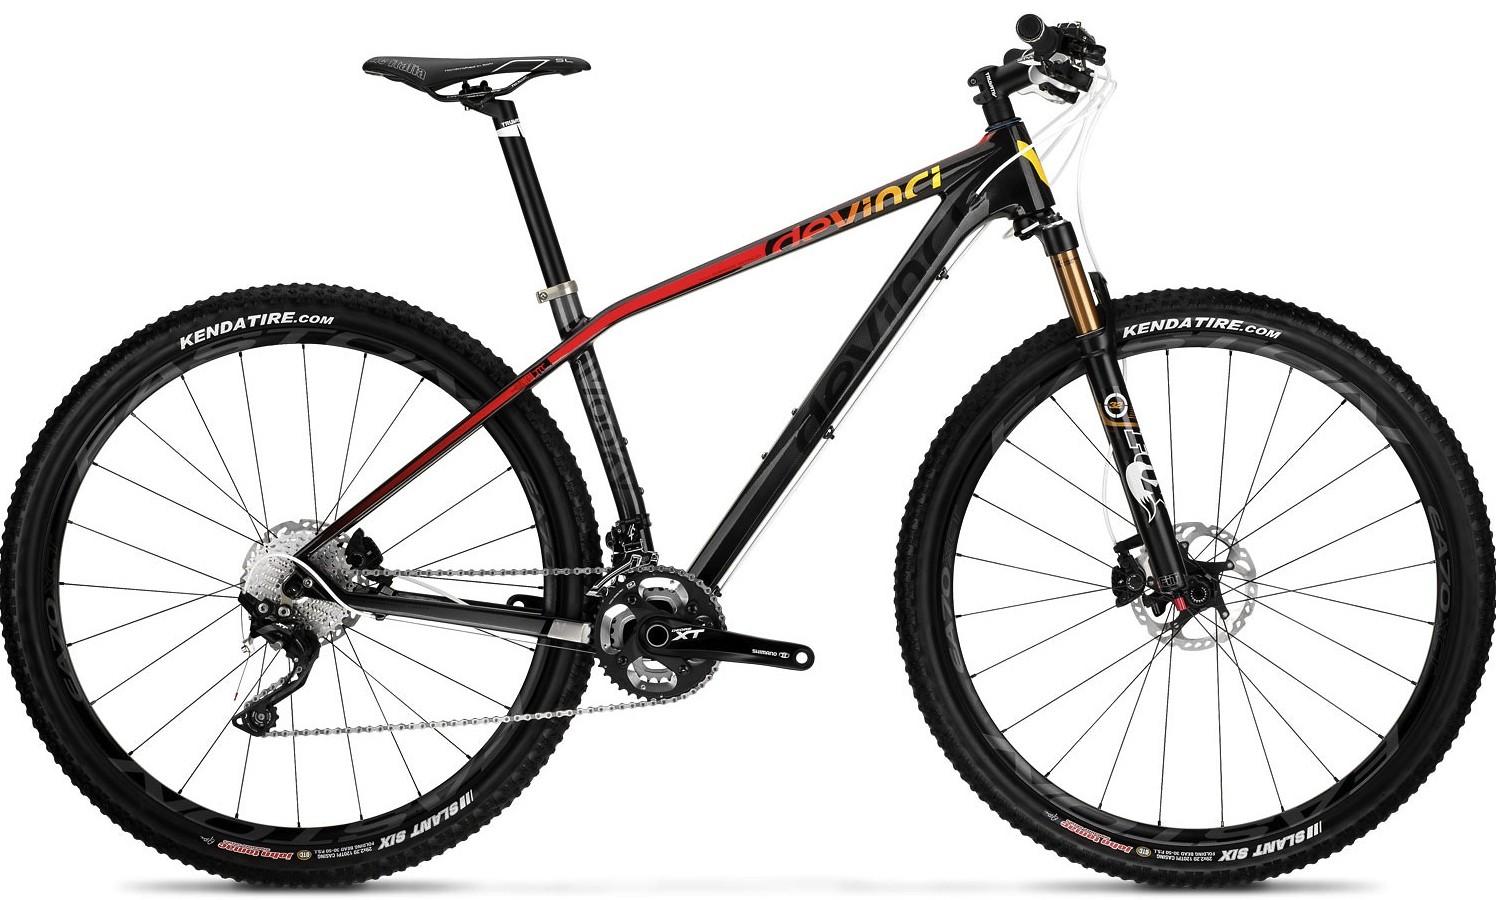 2013 Devinci Wooky Carbon SL Bike 2013 Devinci Wooky Carbon SL